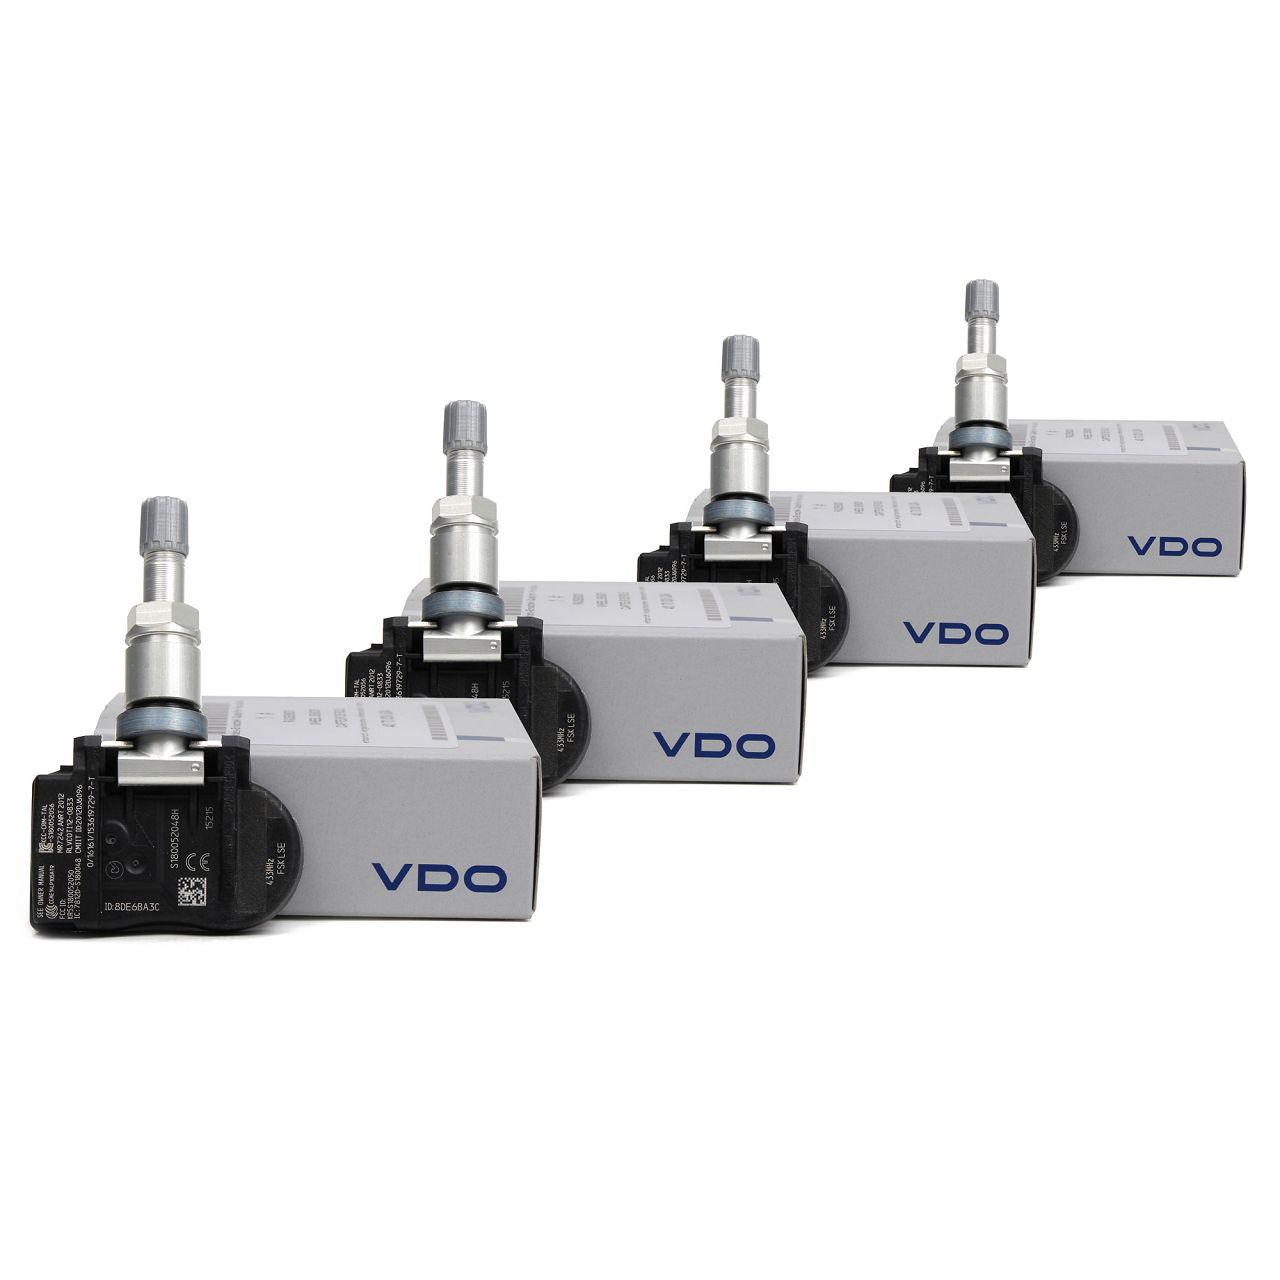 4x VDO Radsensor RDKS TPMS Reifendrucksensor Qashqai X-Trail Koleos S180052048Z